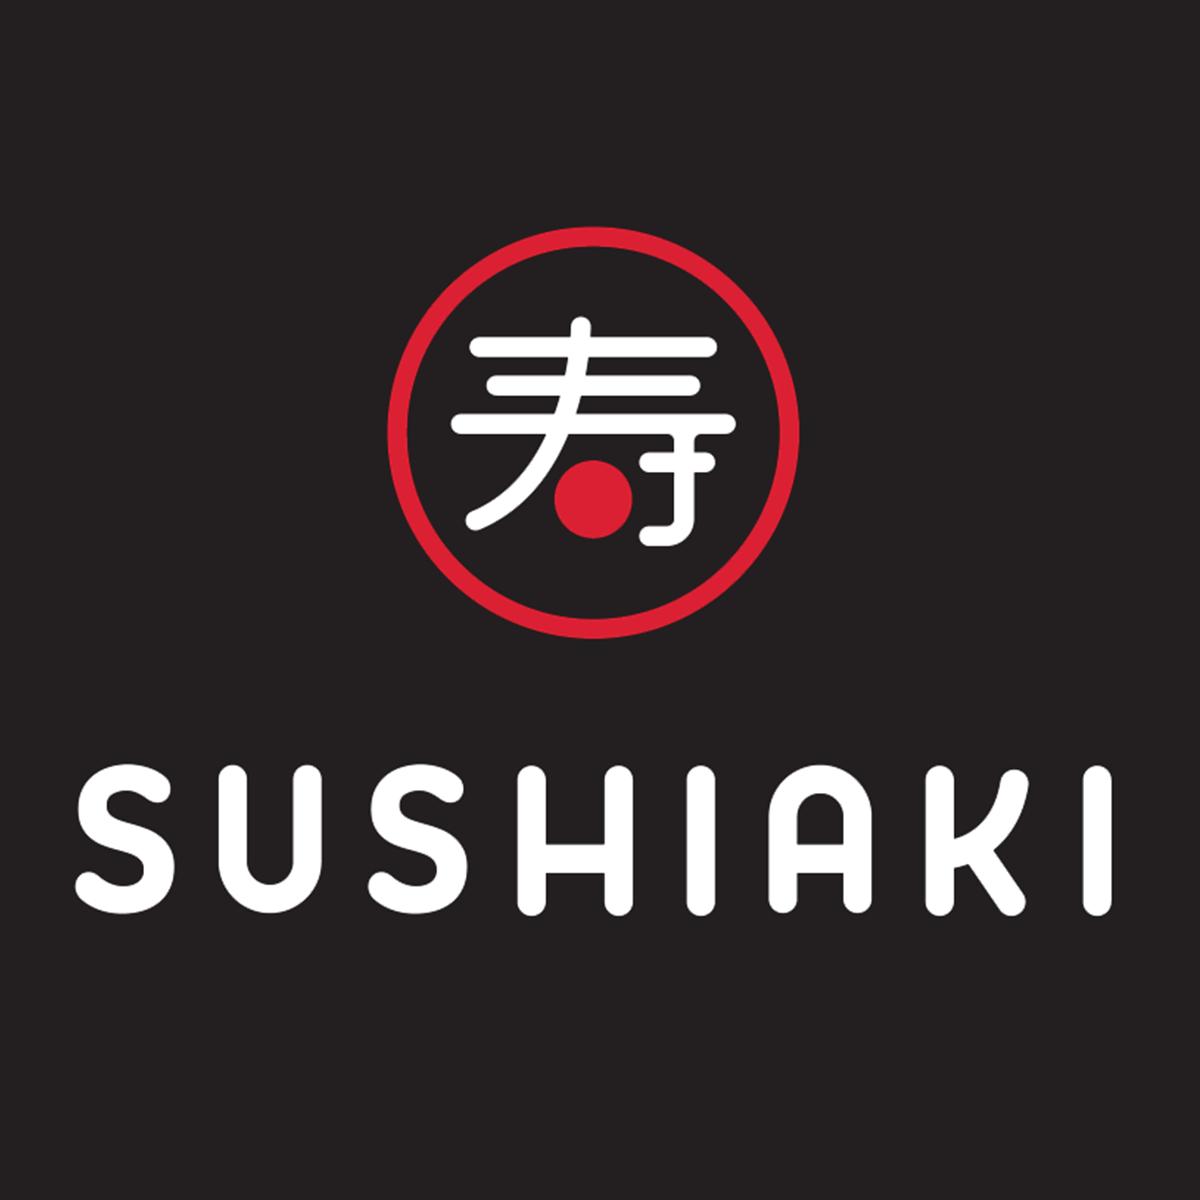 Logo-sushiaki_fundo_preto-04